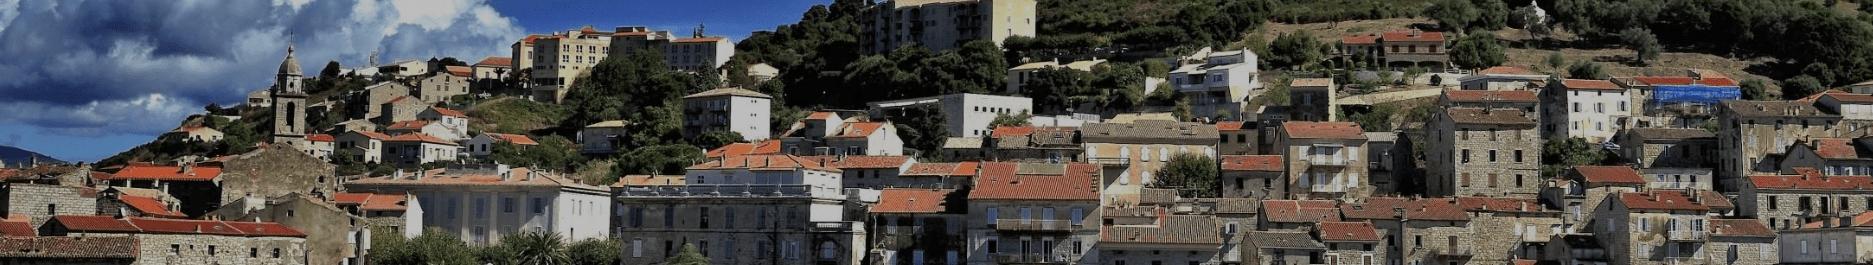 hotel-barticcia-propriano-incentive-reunions-corse-du-sud-seminaires-de-caractere